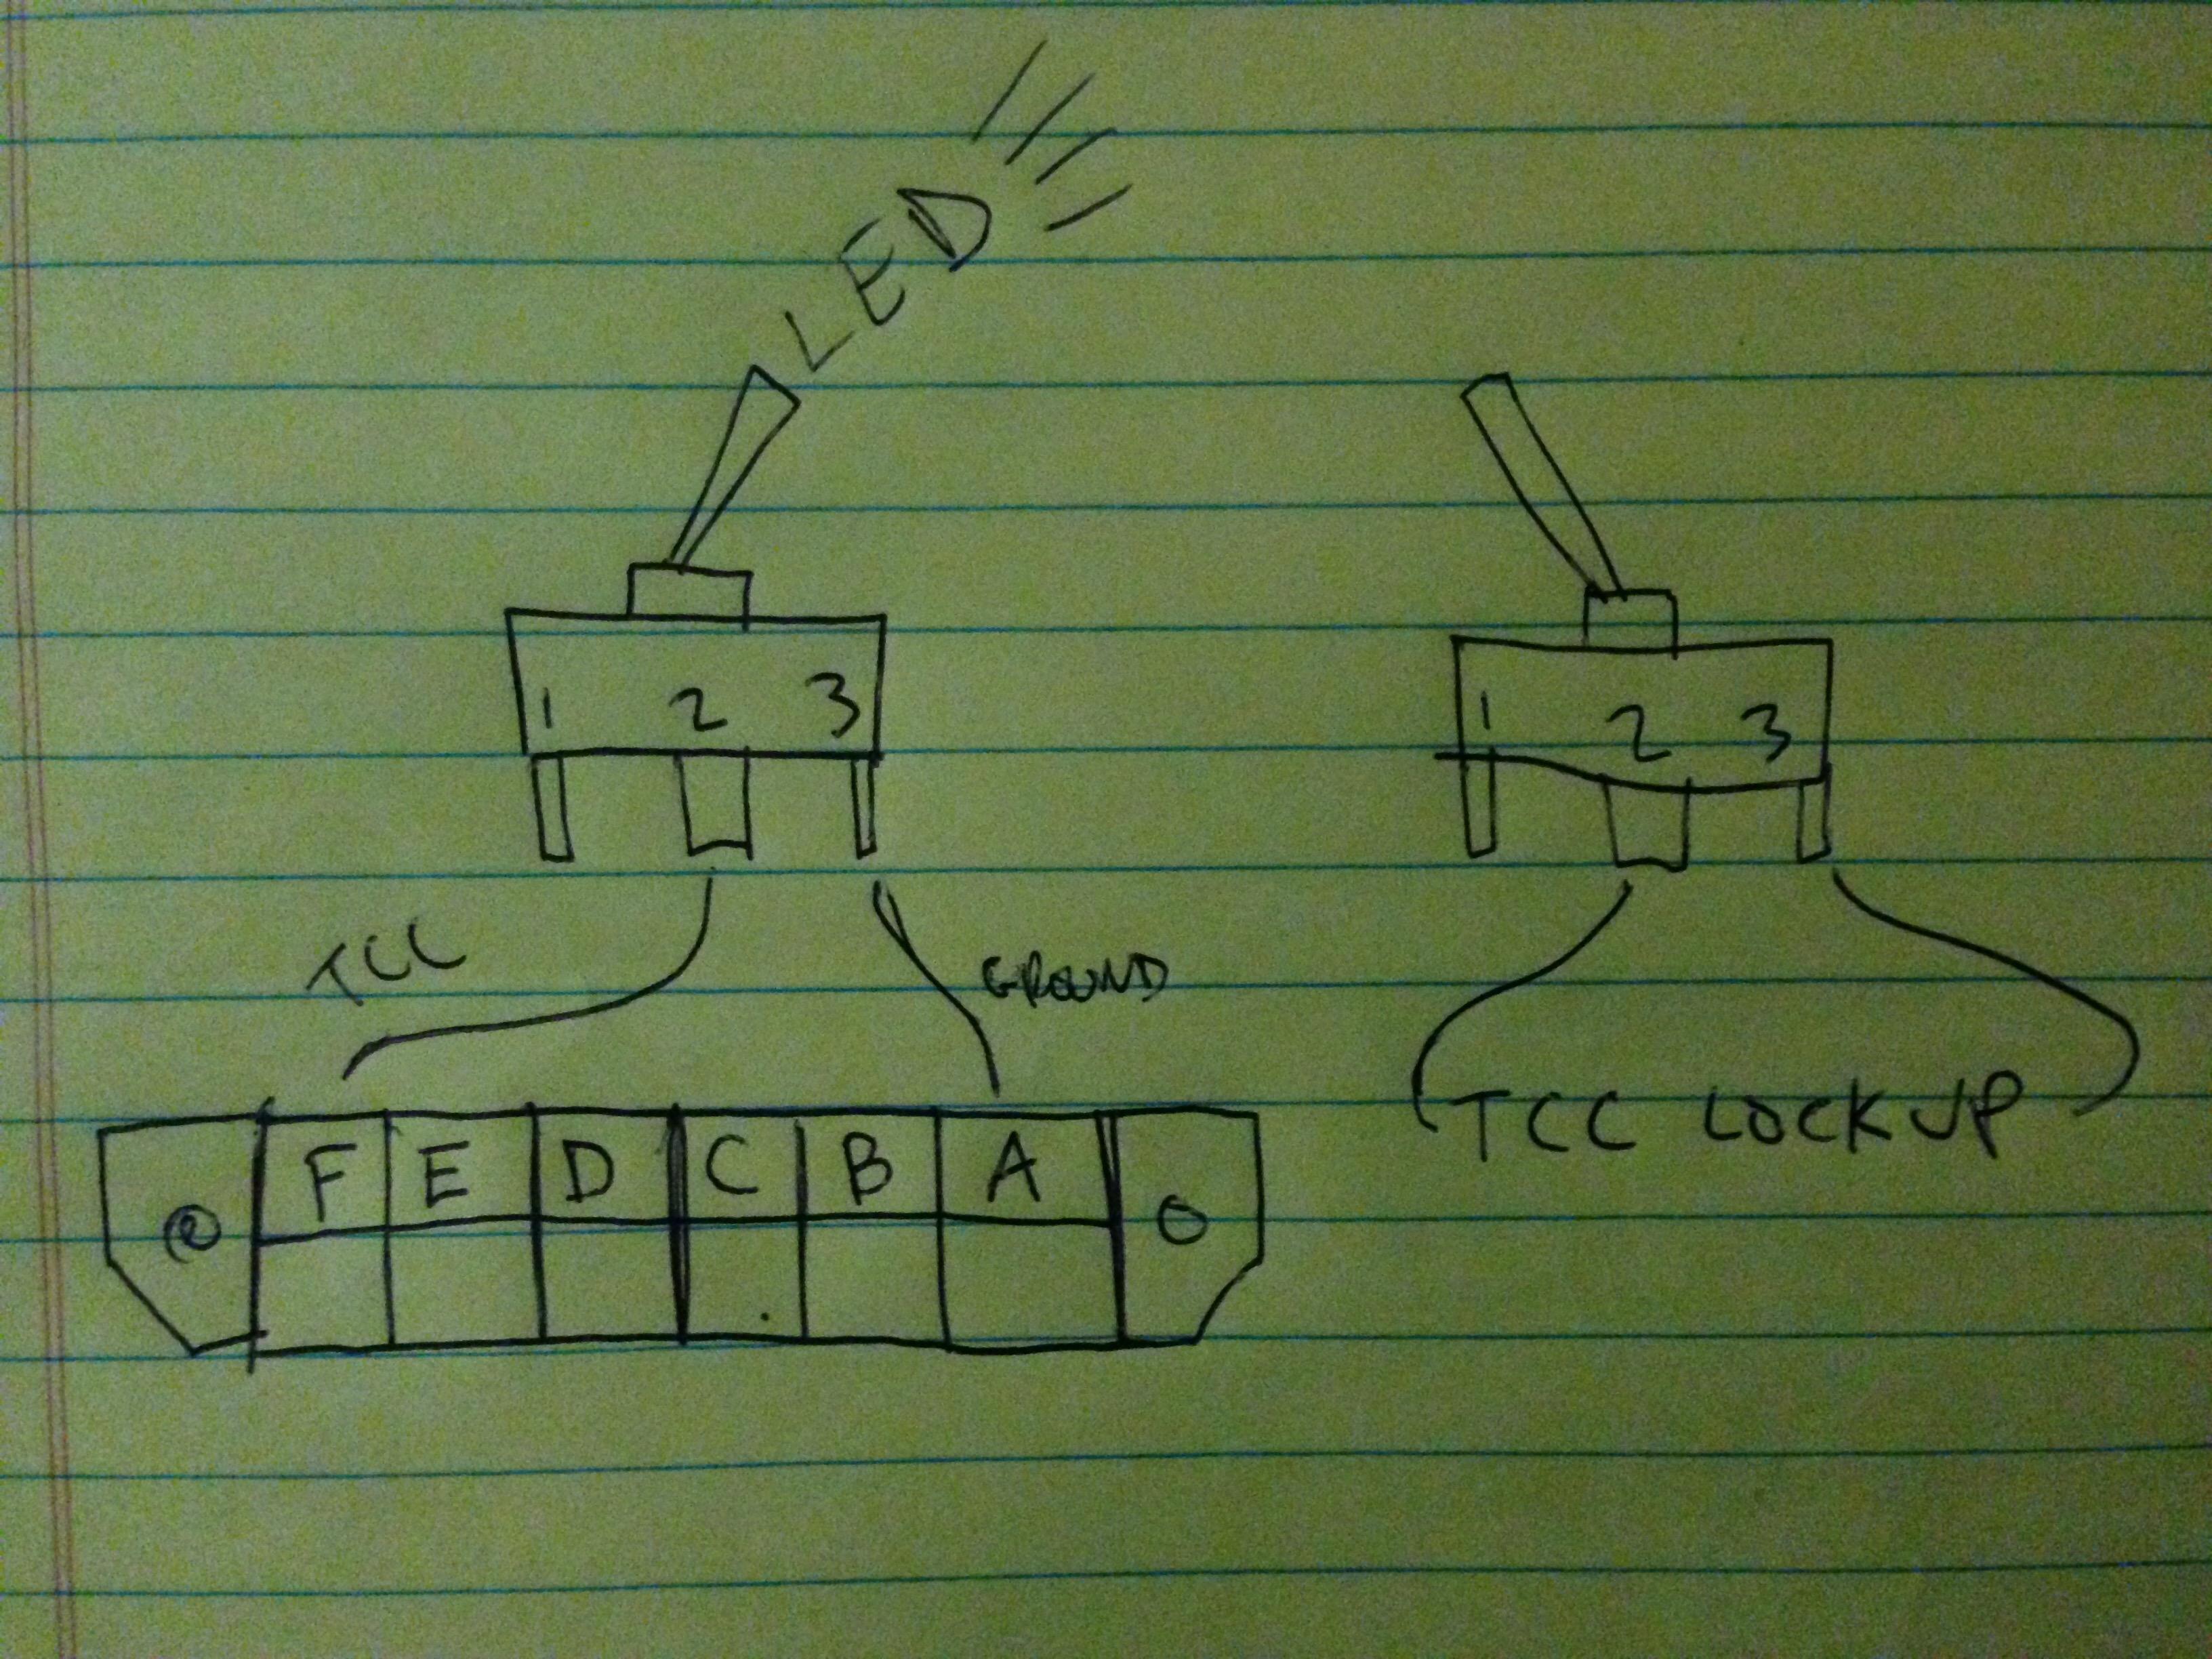 Tcc Lock Up Toggle Switch Diagram For Ccc Delete El Camino Central Forum